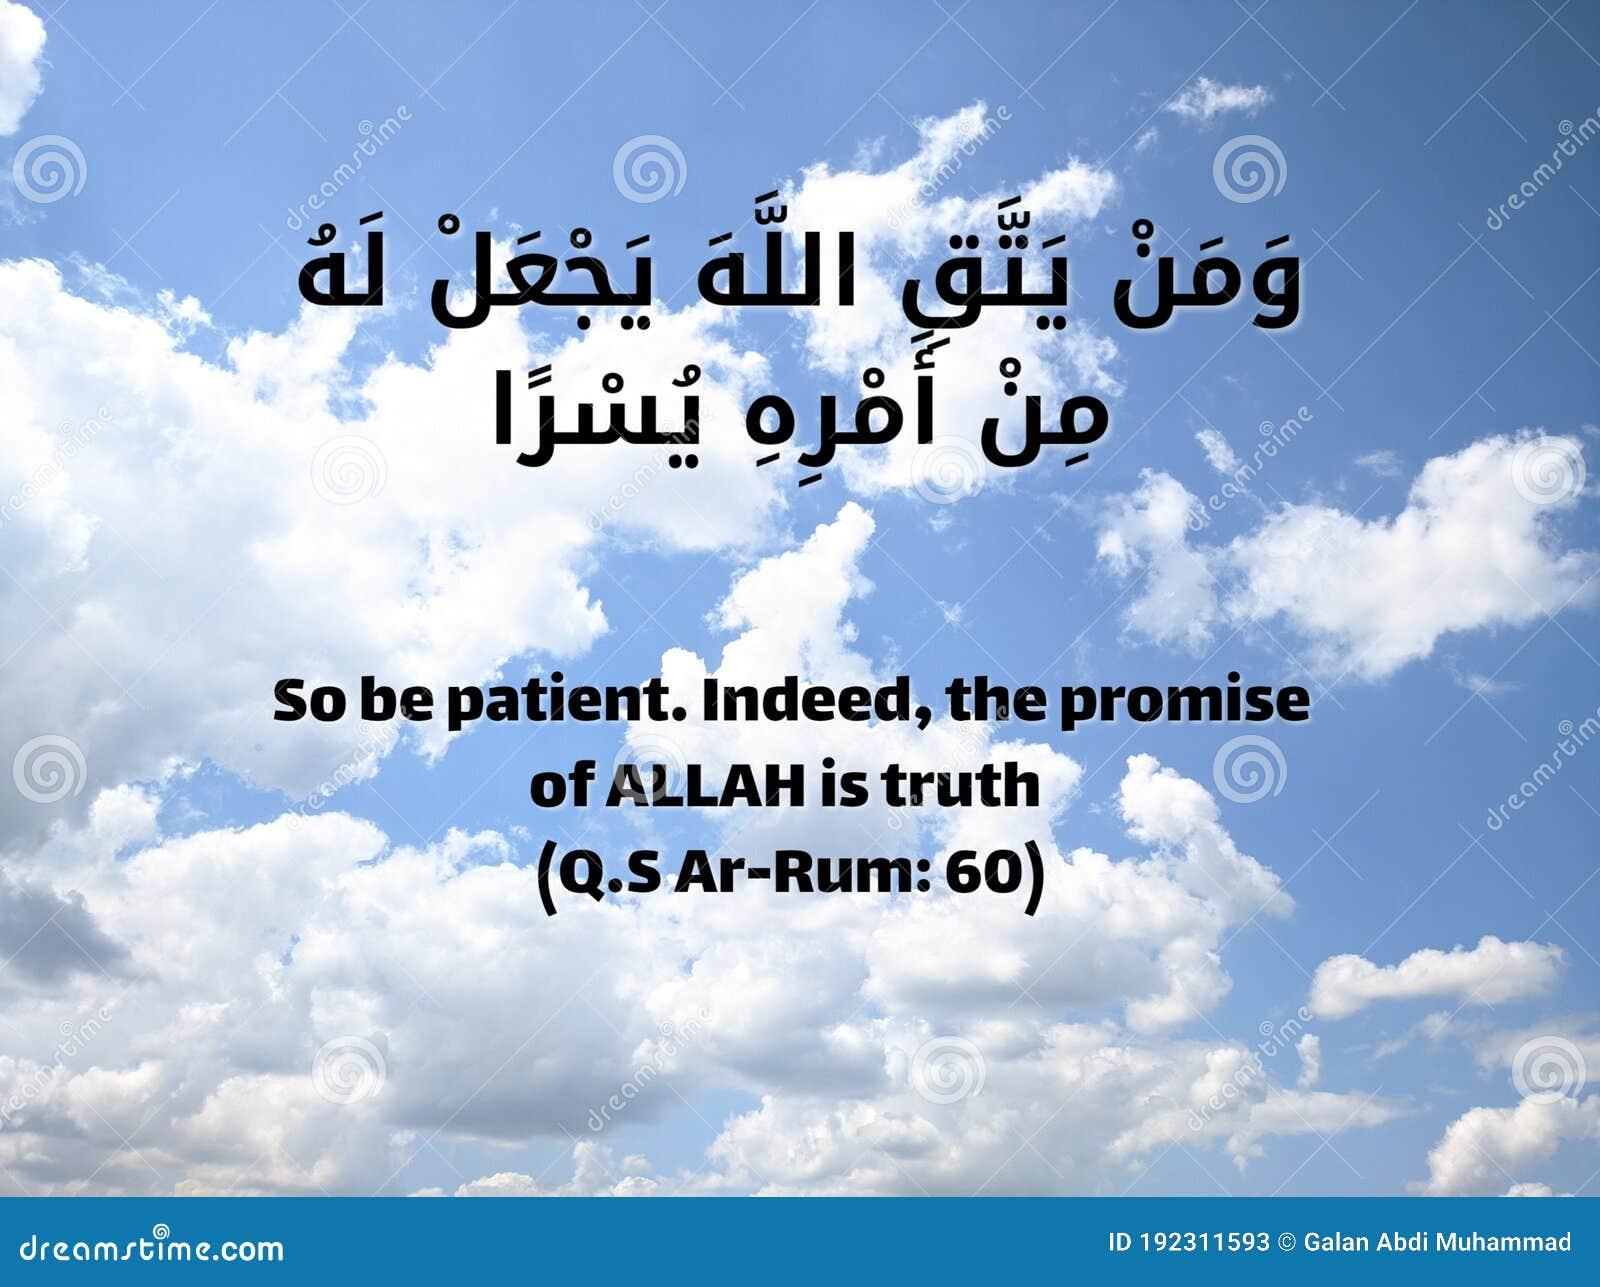 English in quran surahs Read Last